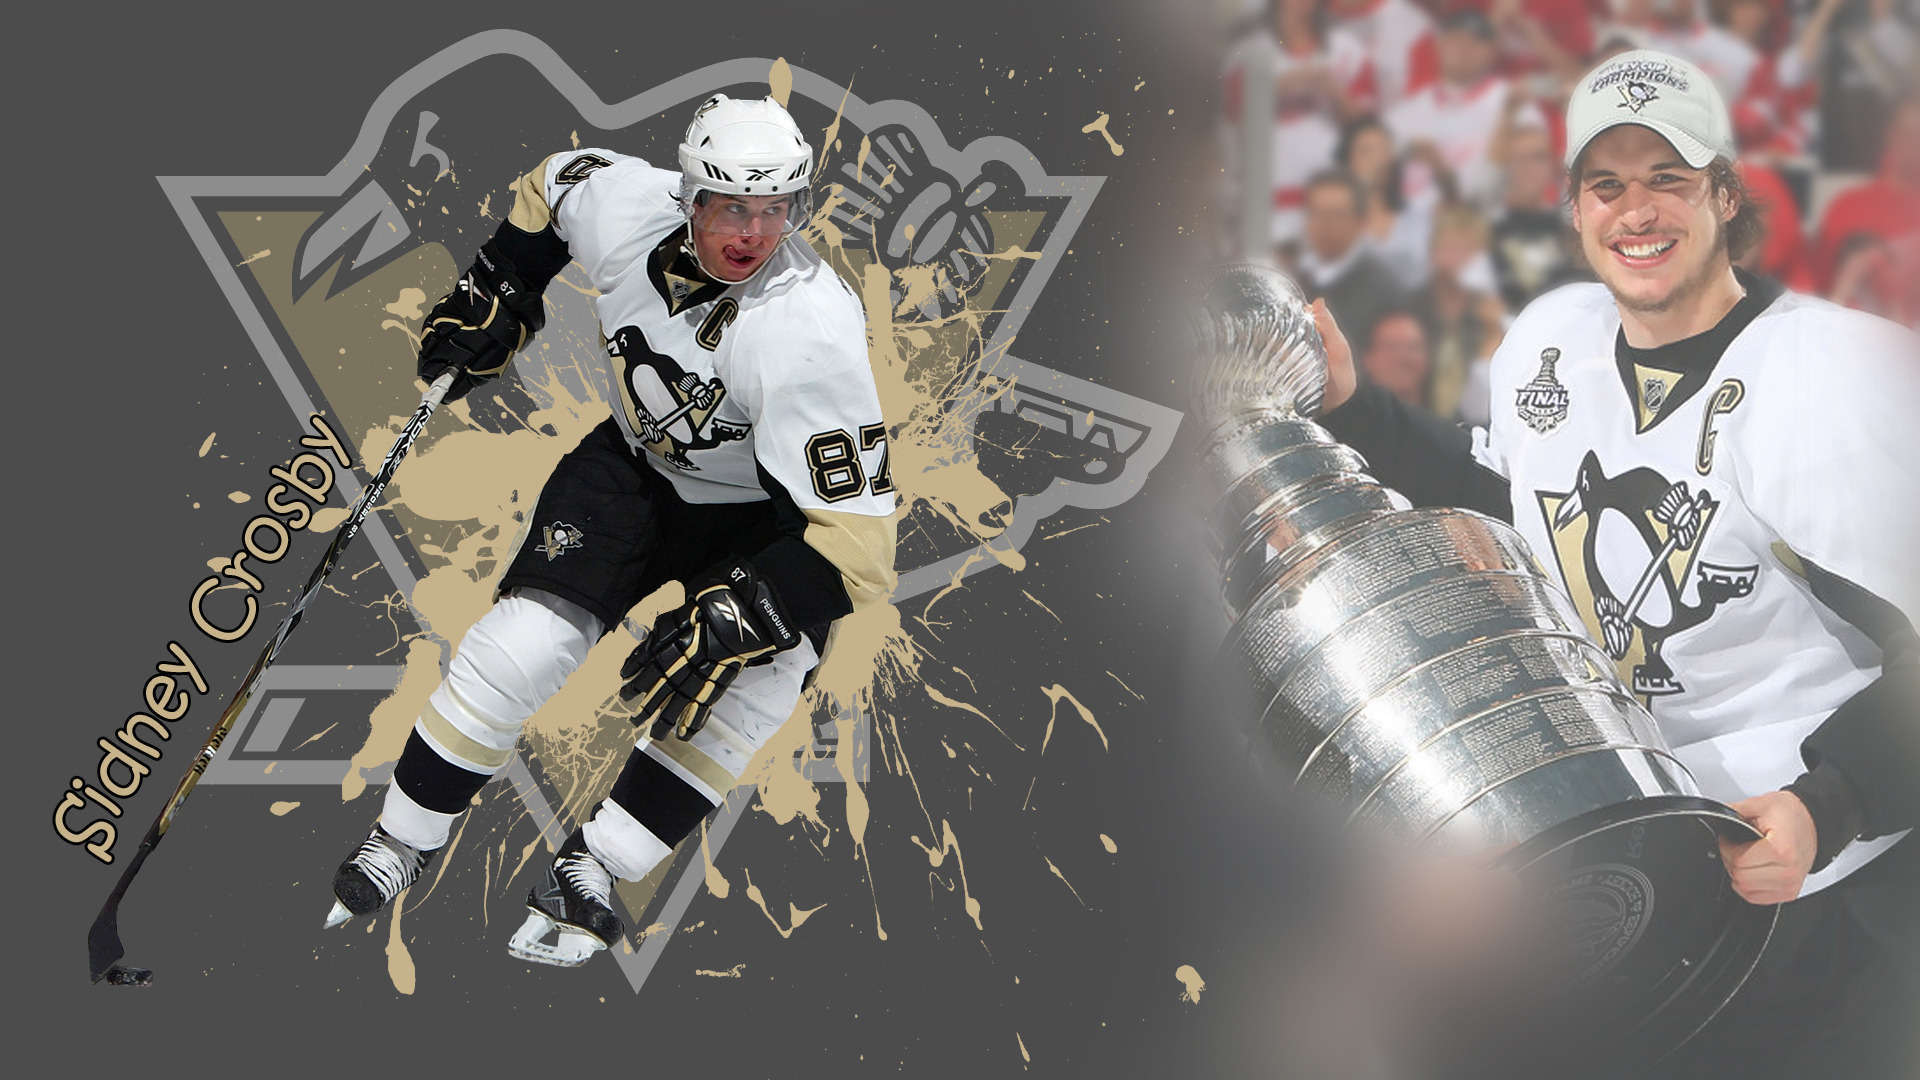 Sidney Crosby HD Images 8 1920x1080